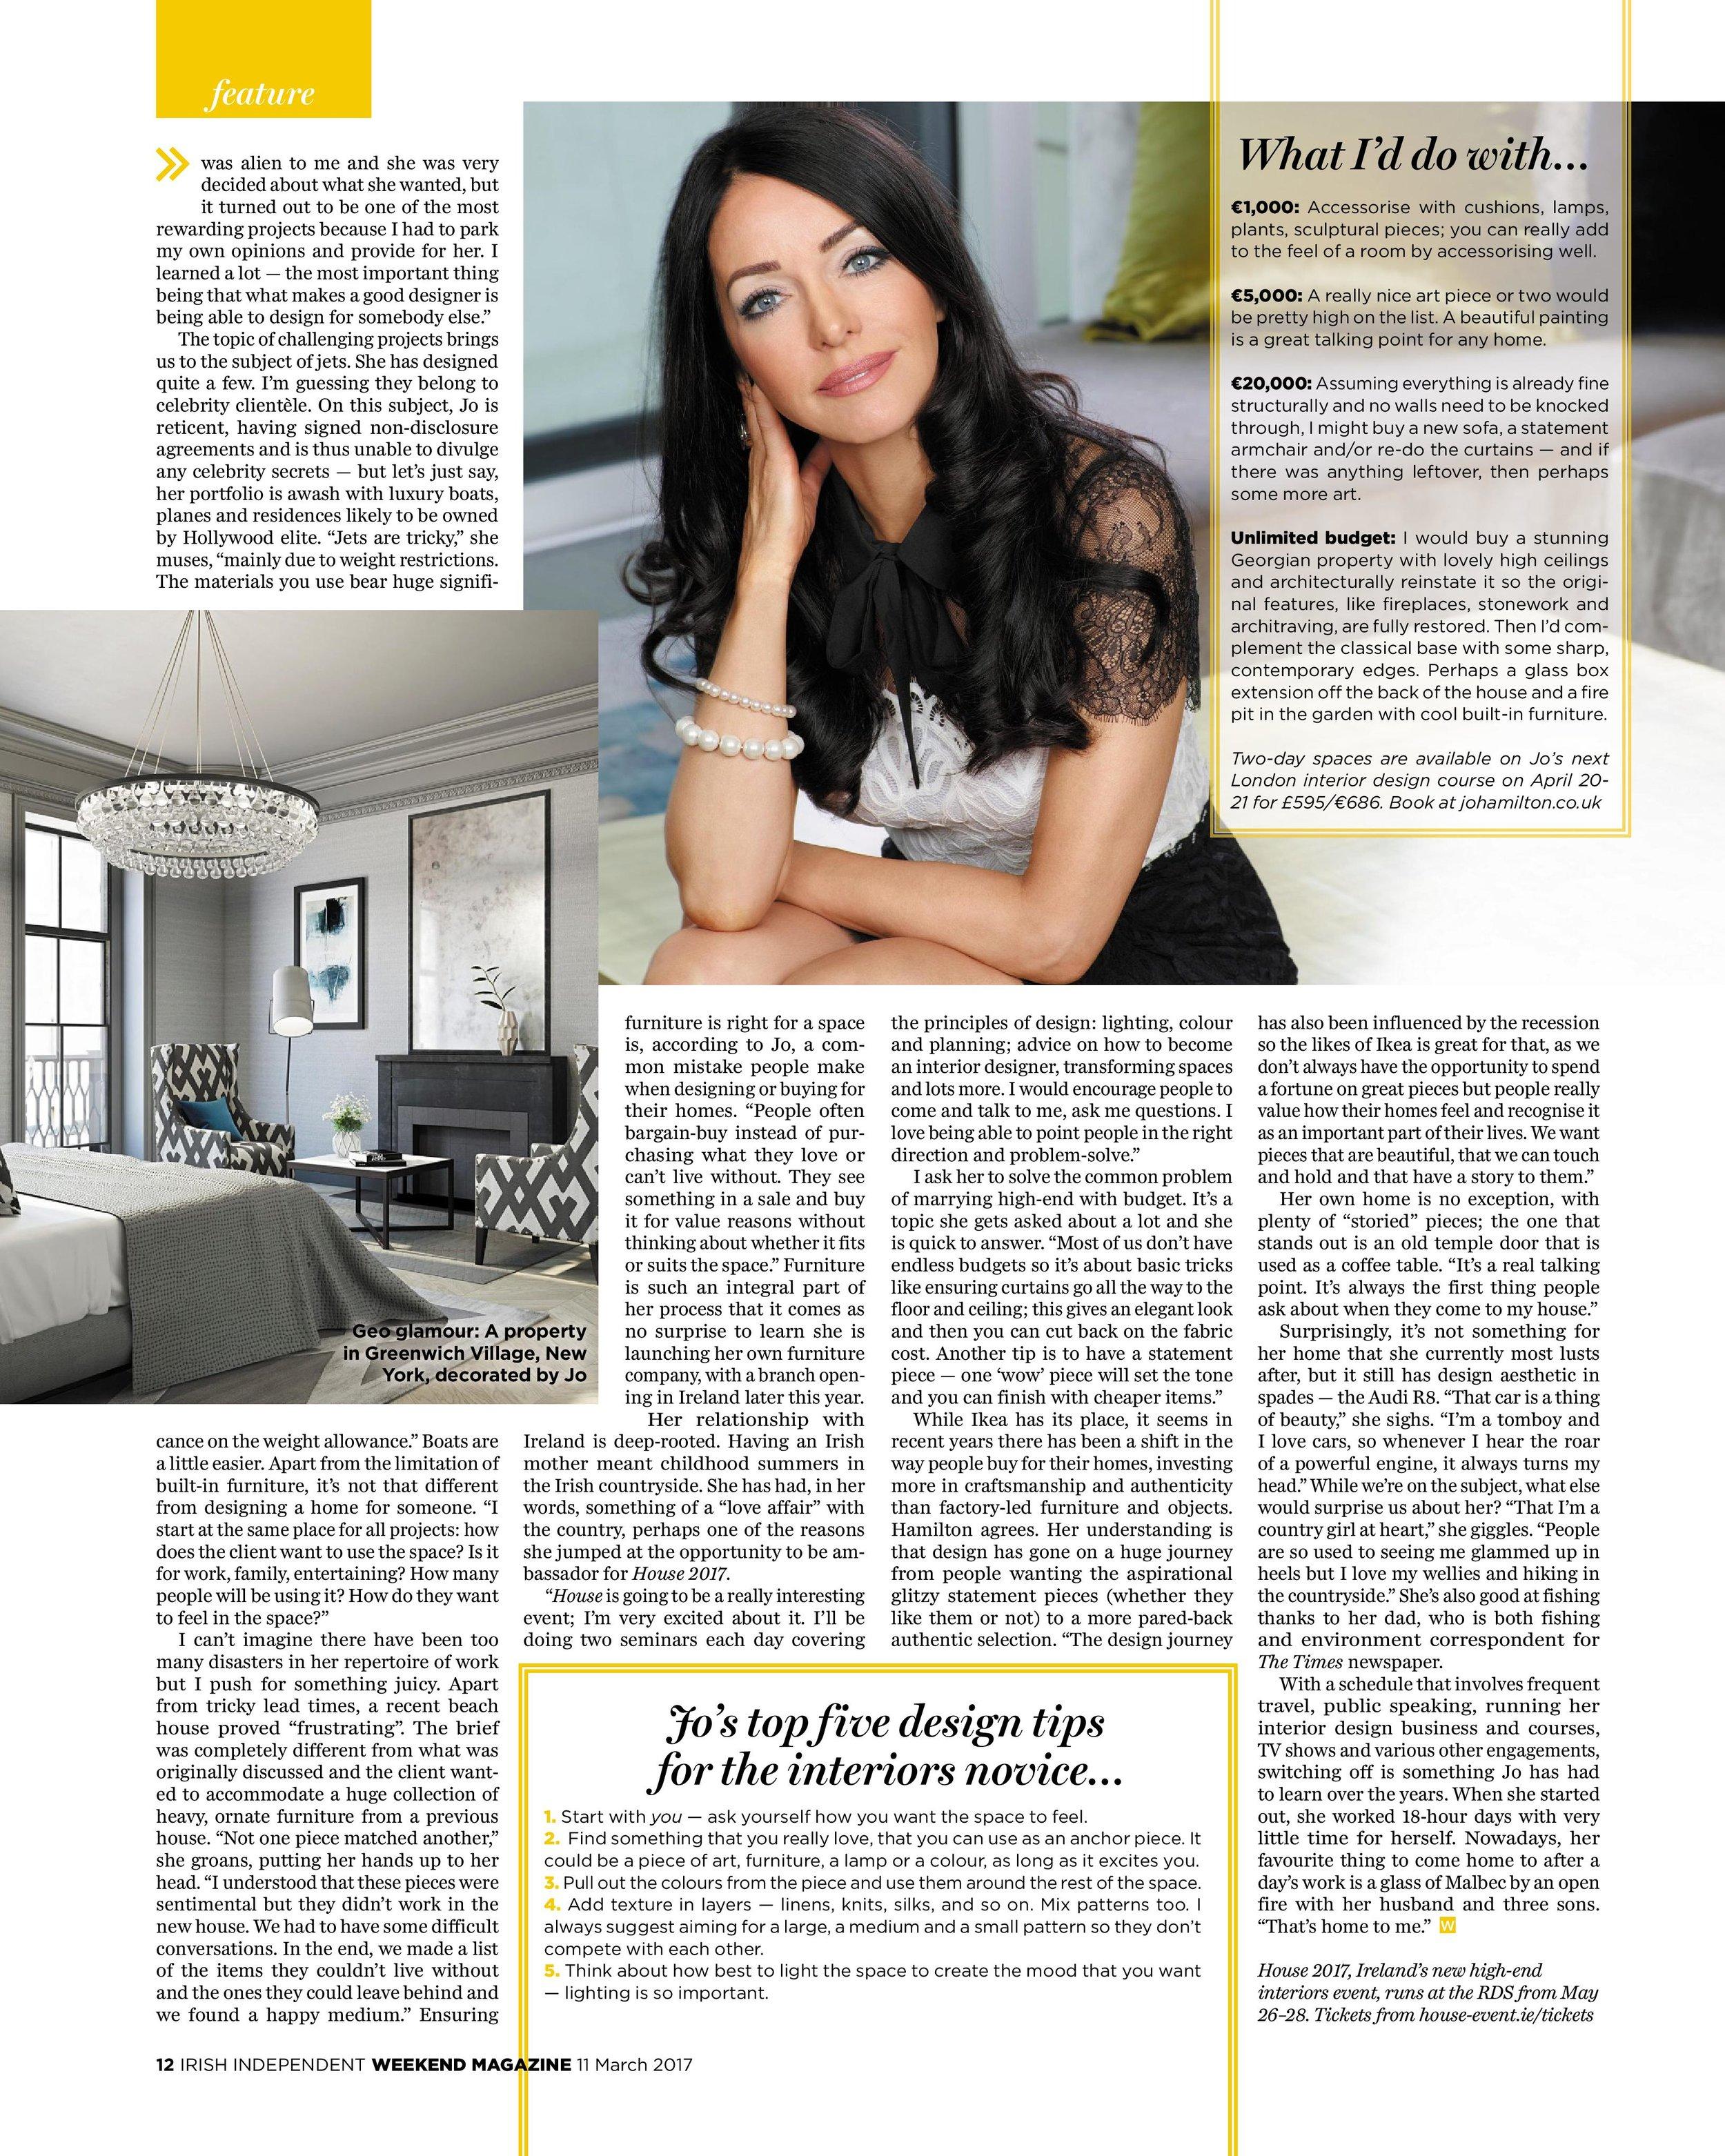 High-end London interior designer Jo Hamilton Irish Independent Weekend page four